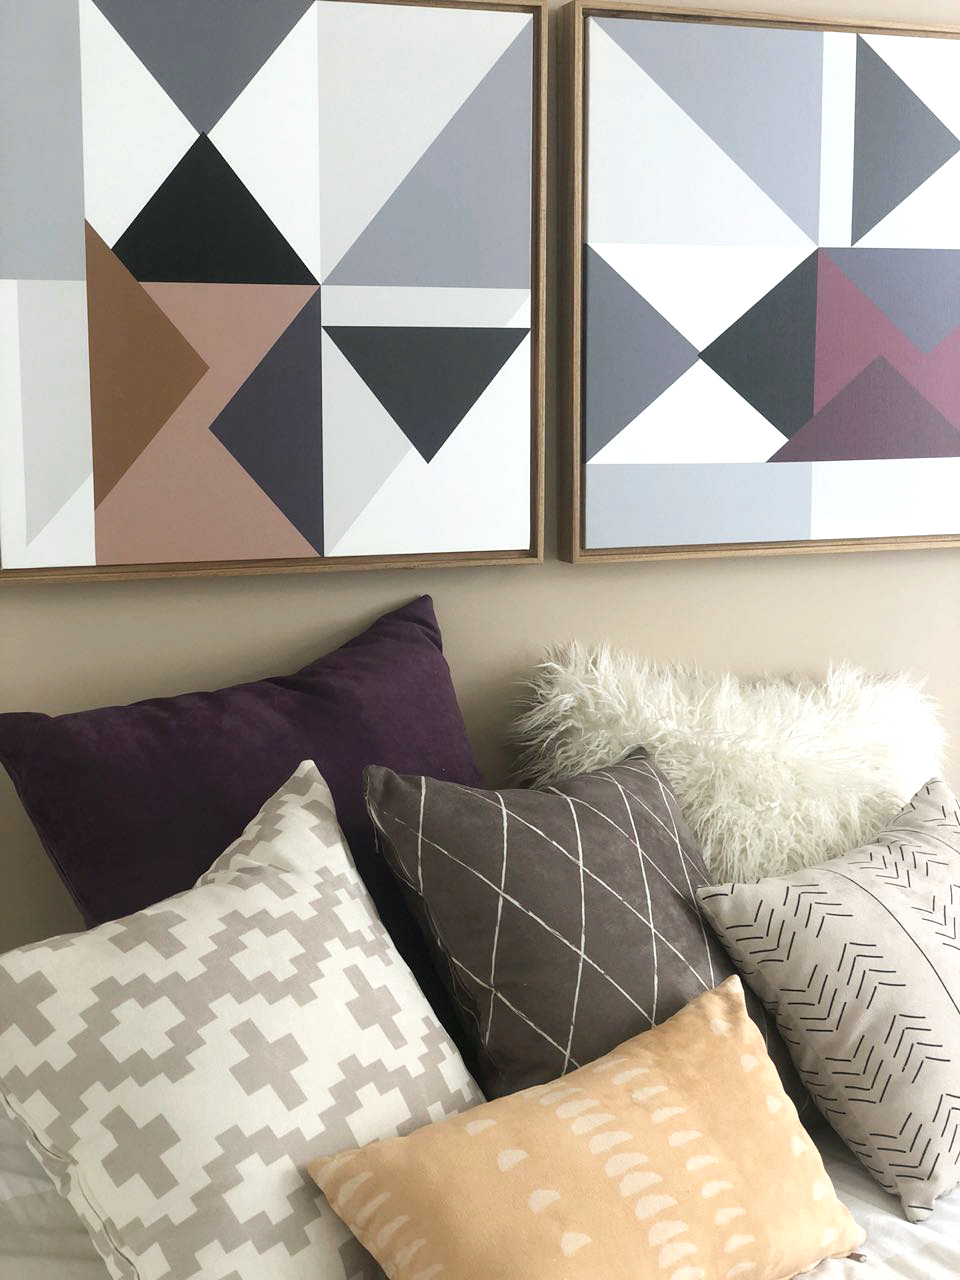 Arrows - duo na paleta beringela 0,60 x 0,60m  PROJETO cris salles interiores